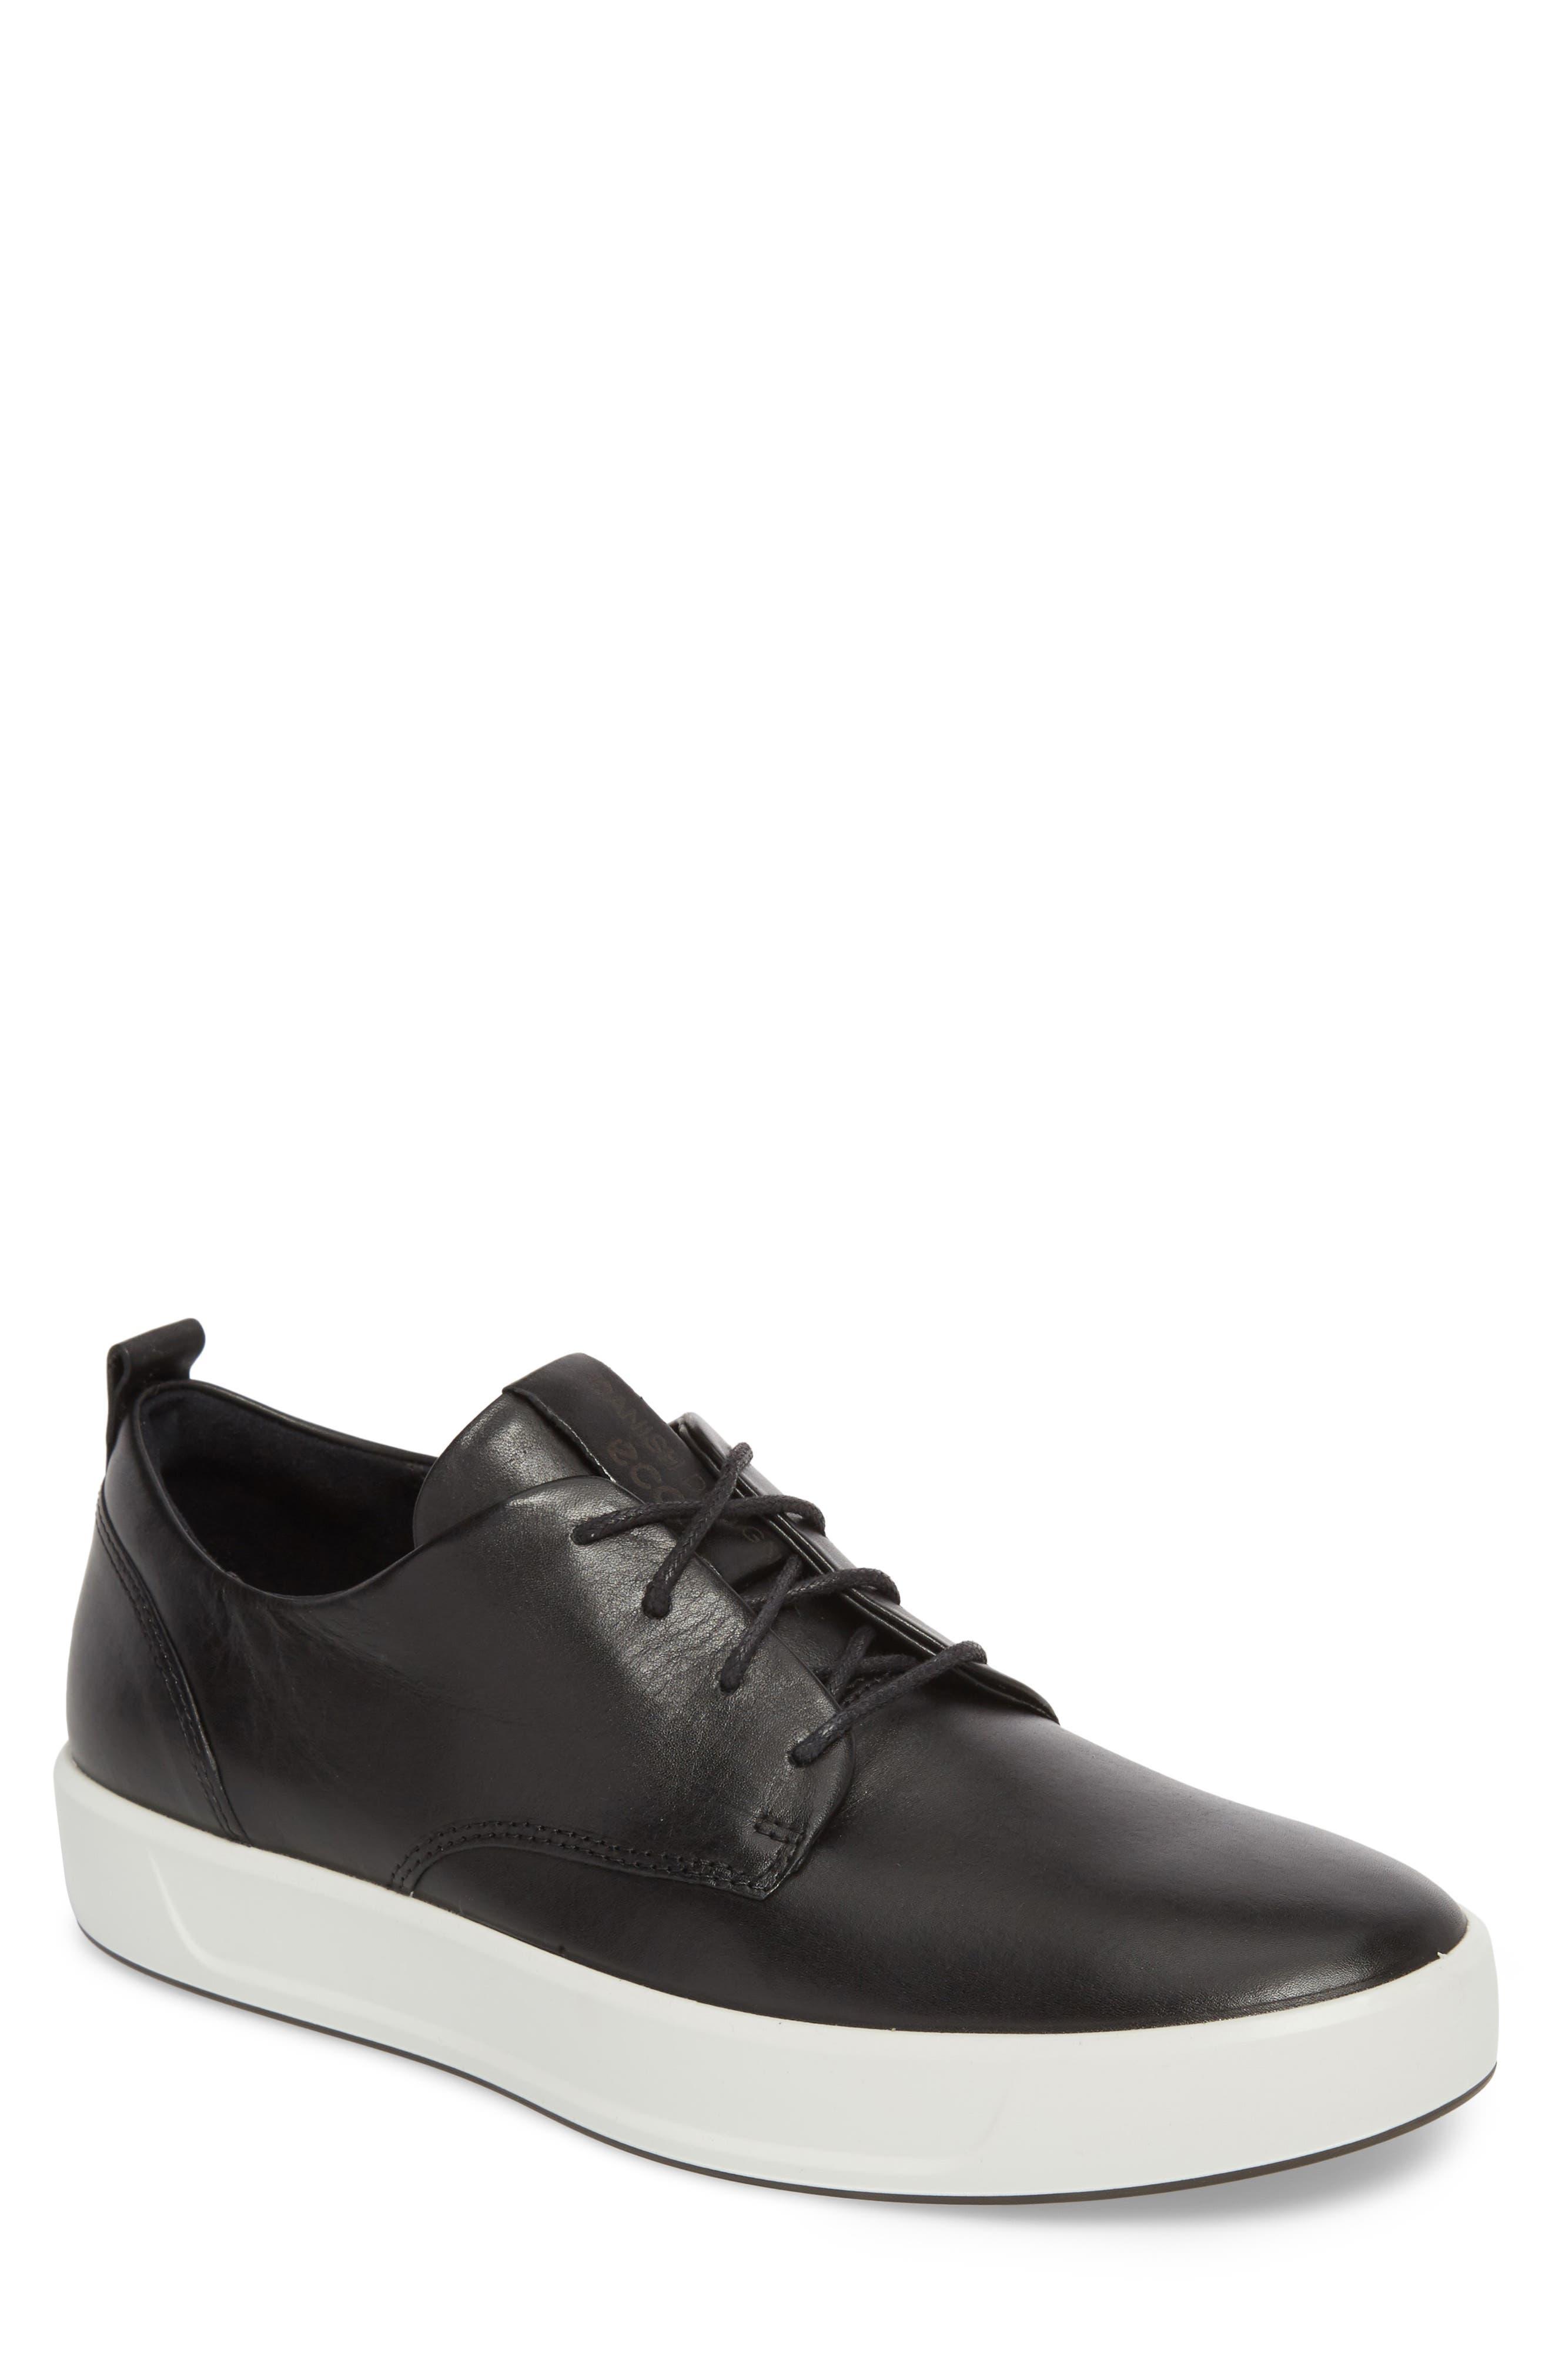 ECCO Soft 8 Street Sneaker, Main, color, 009